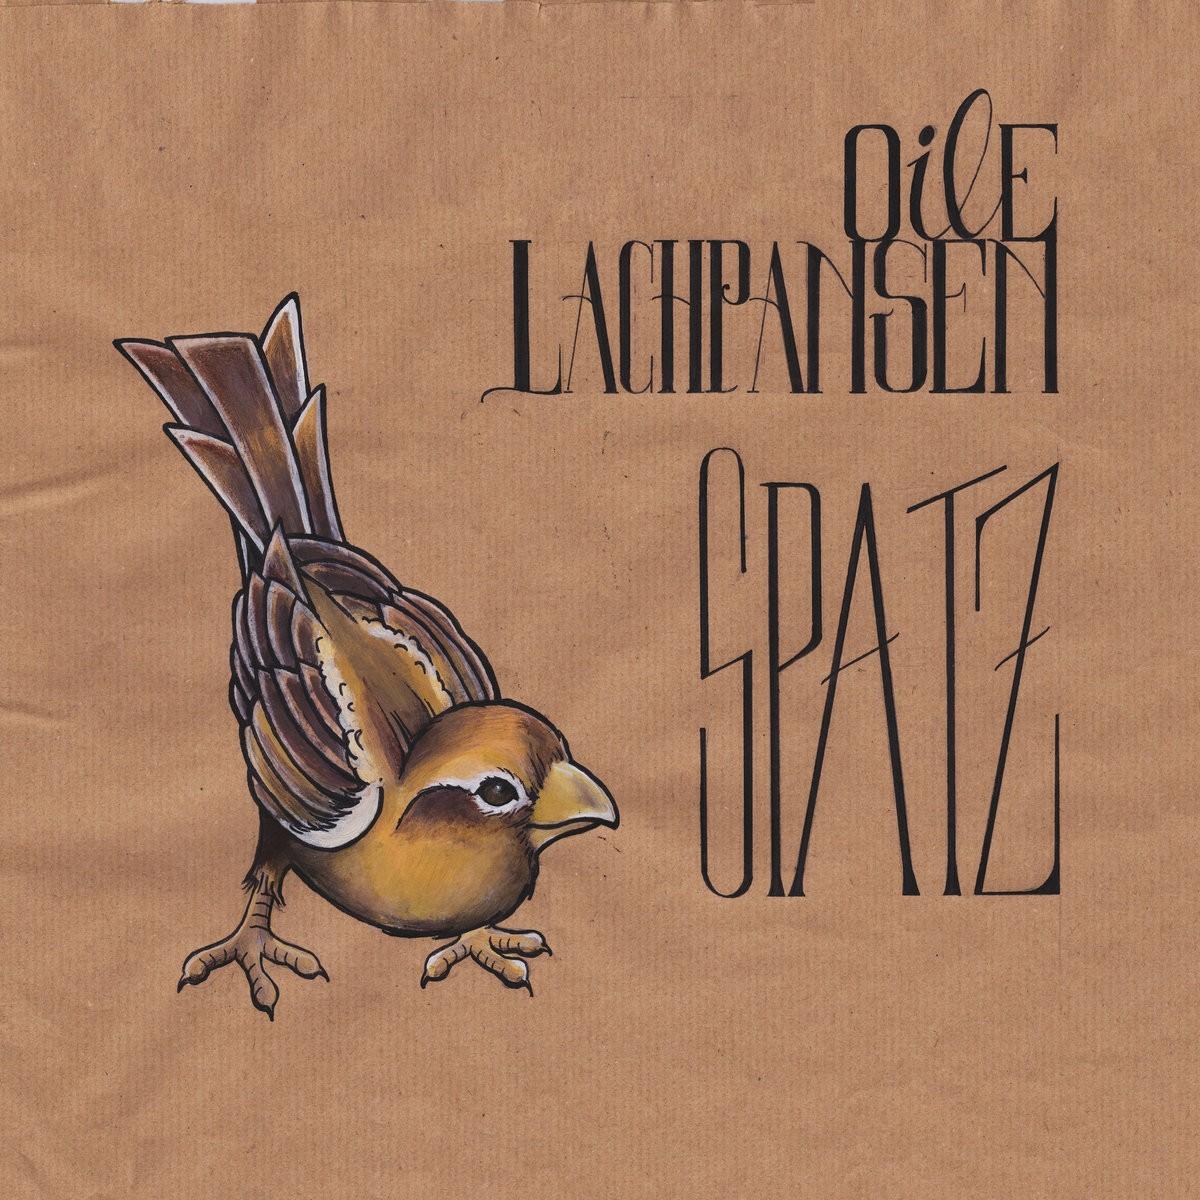 Oile Lachpansen - Spatz LP (white vinyl)